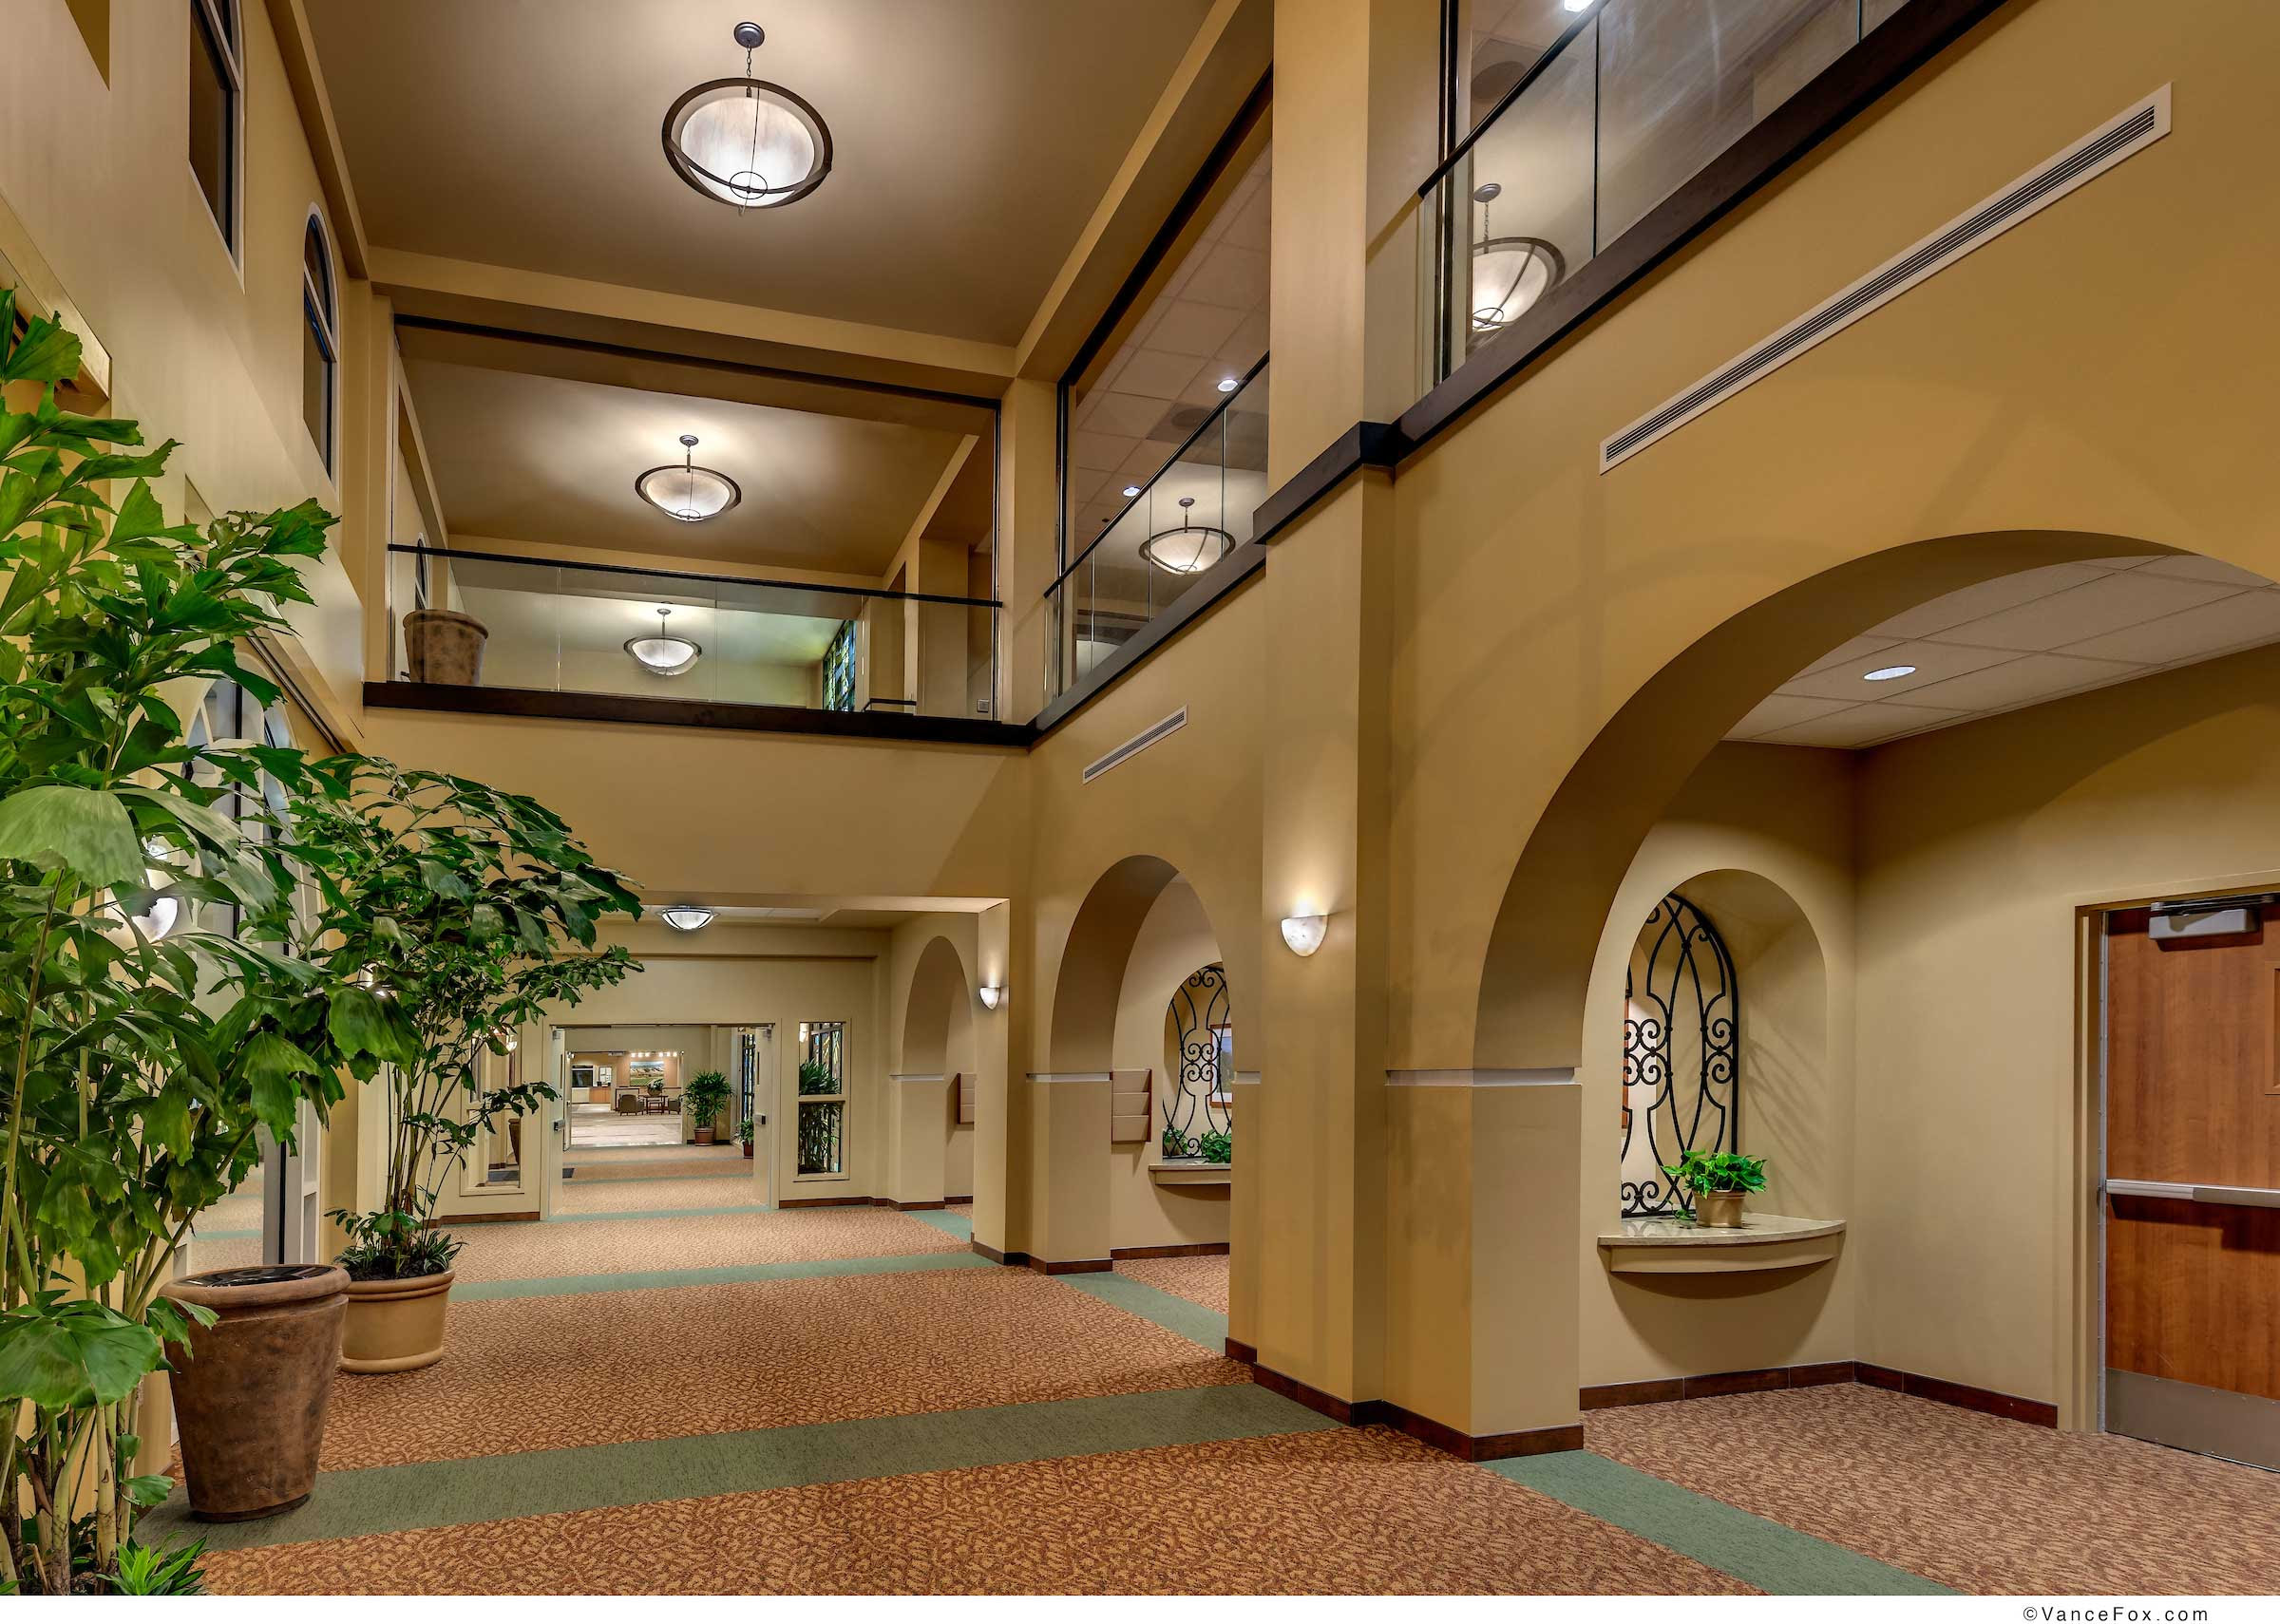 Marian Regional Medical Center, Santa Maria, CA